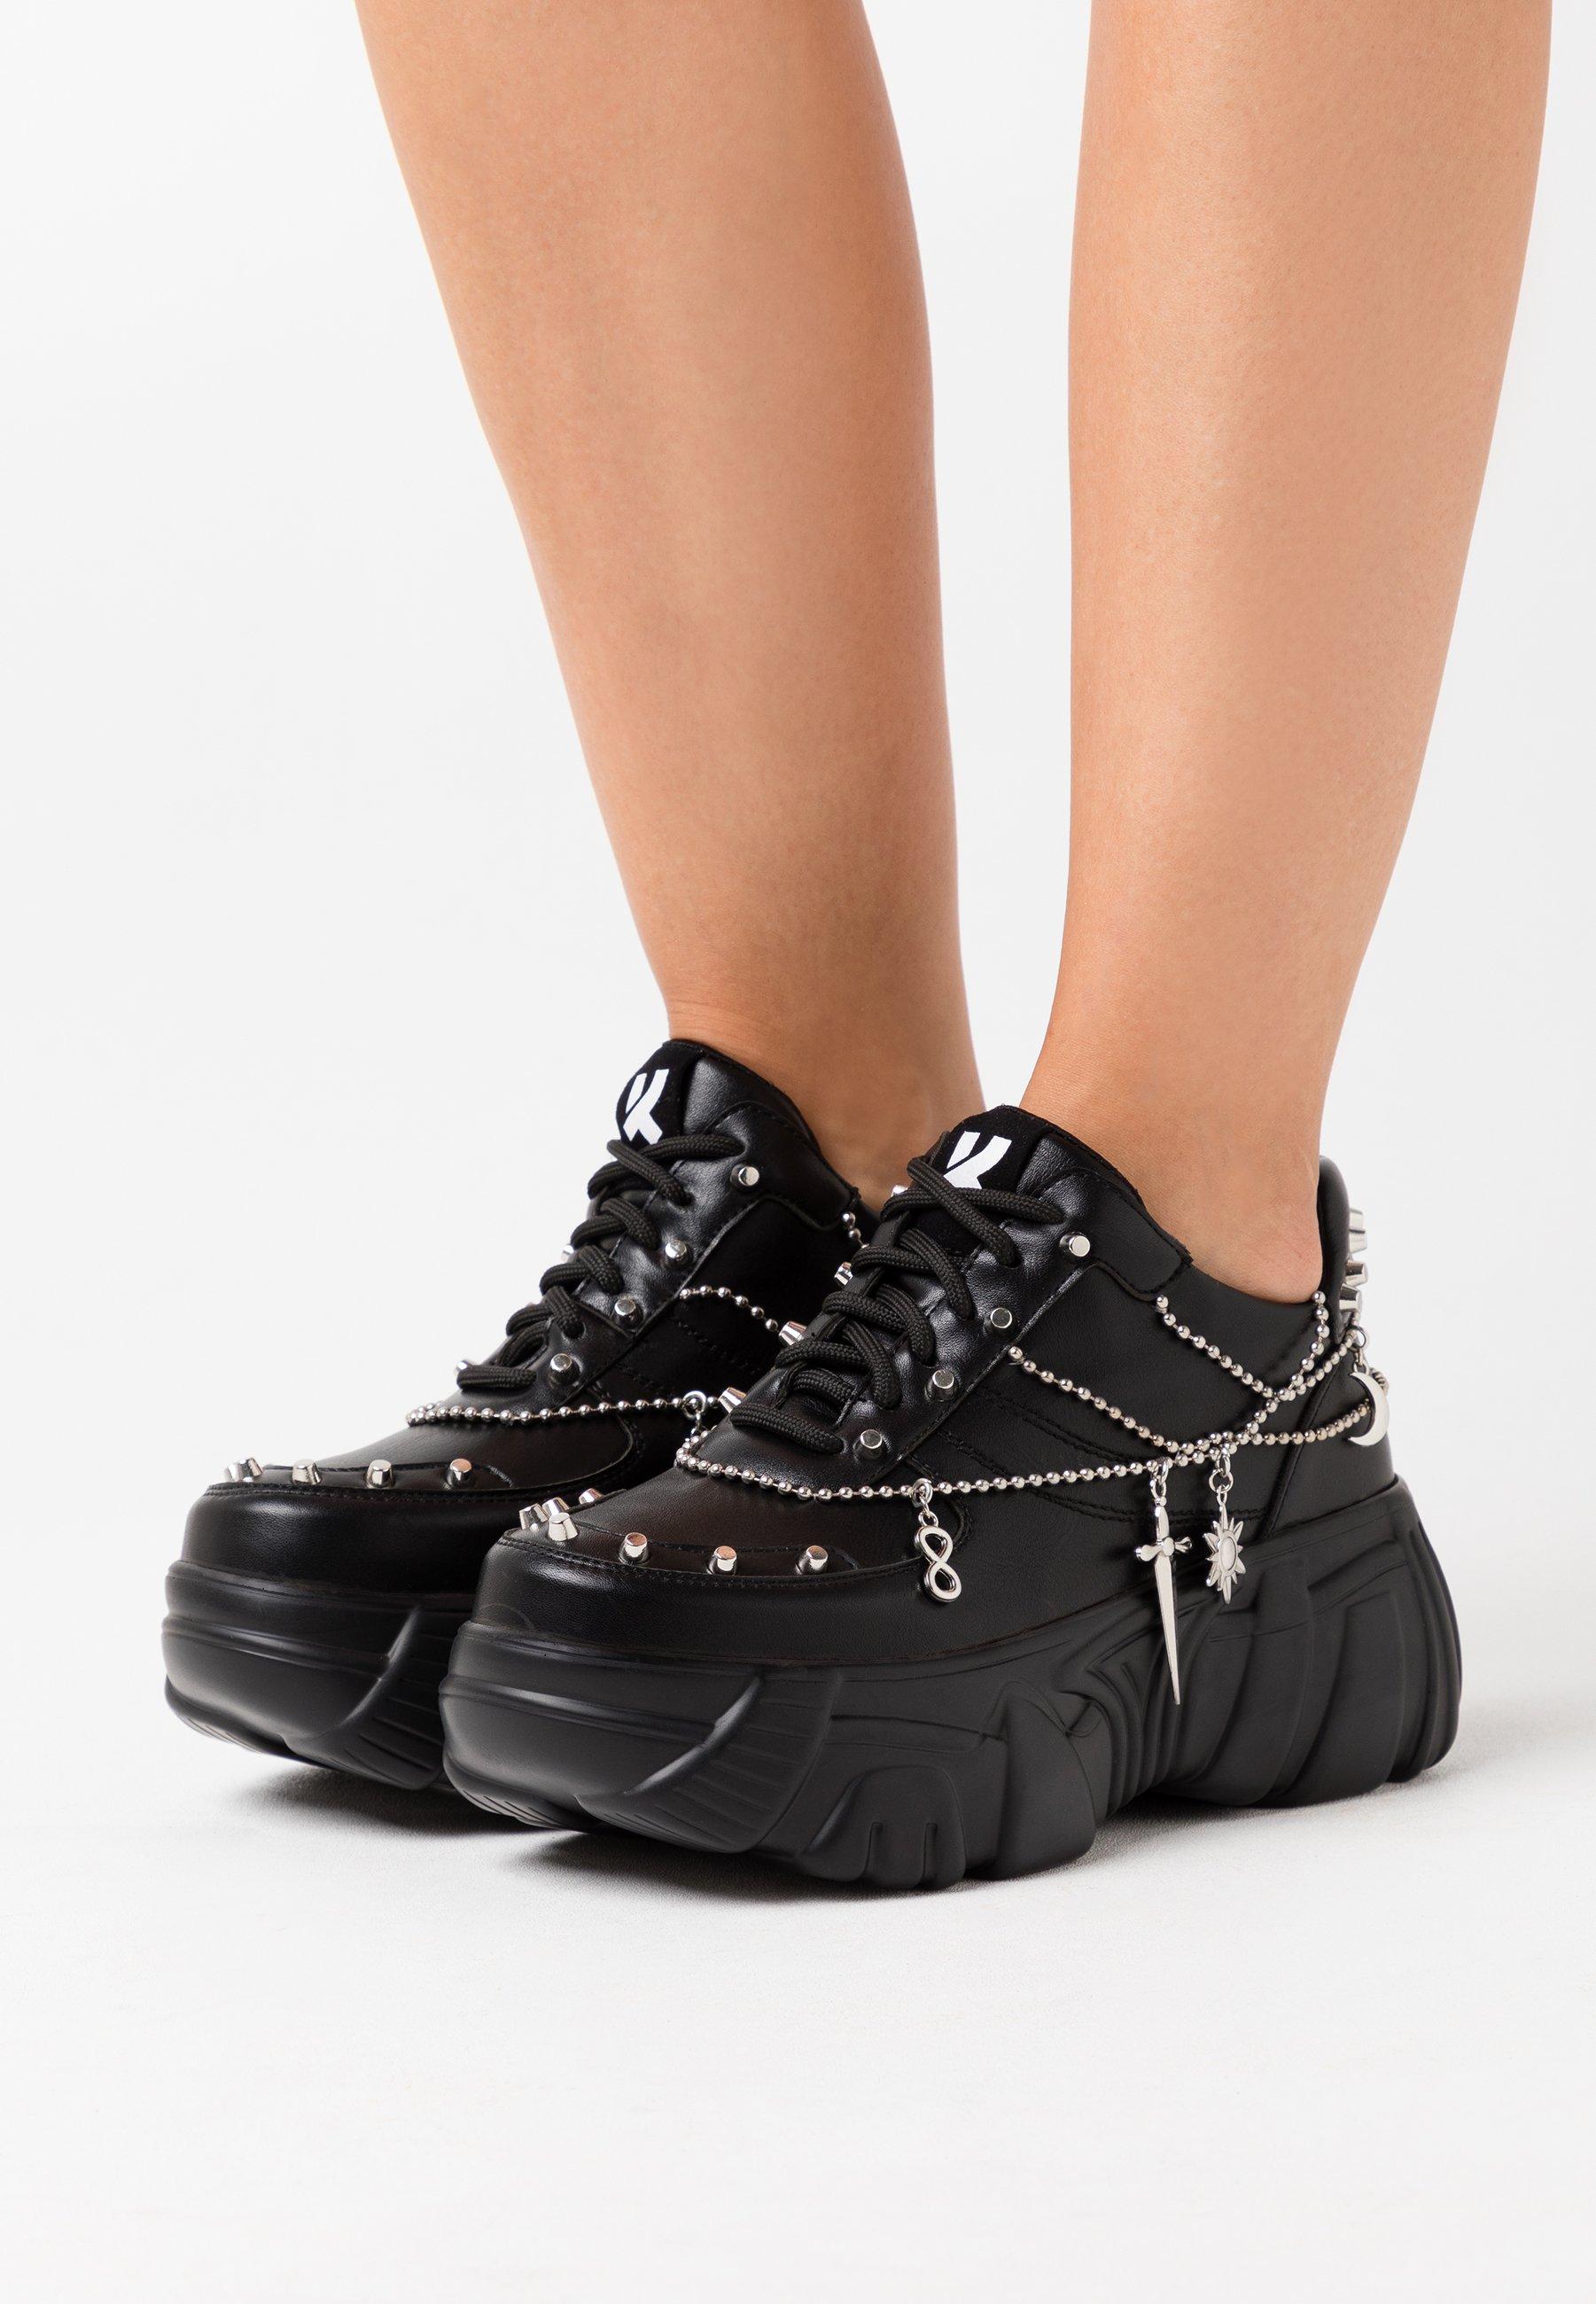 Koi Footwear Vegan Jinx Trainers Black Zalando Ie Koi footwear is a major footwear brand that markets products and services at koifootwear.com. vegan jinx trainers black